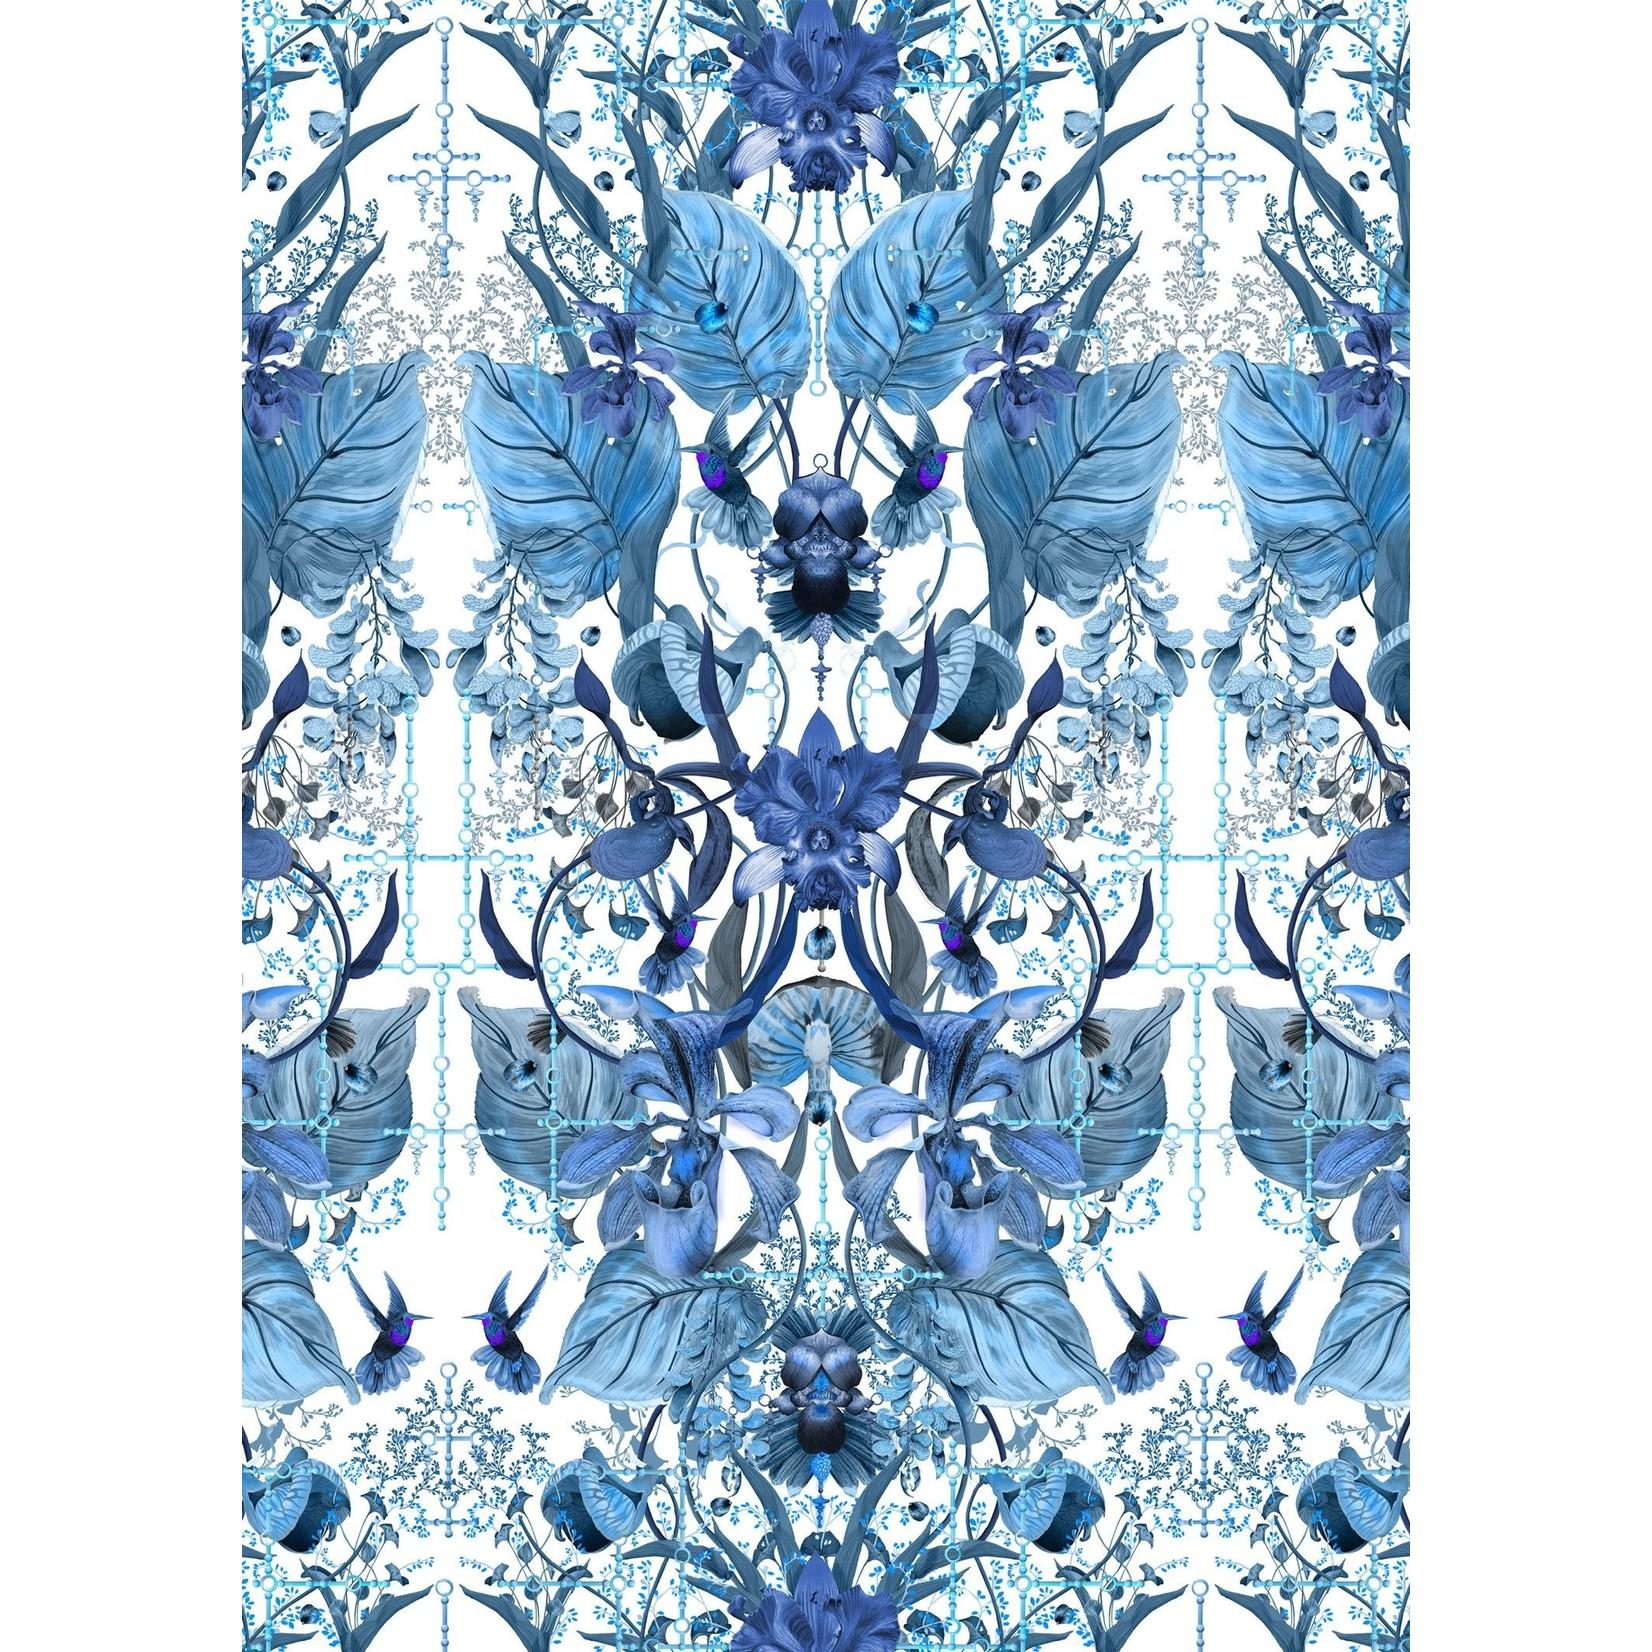 Kit Miles Jardin ultraviolet | Atomic Blue